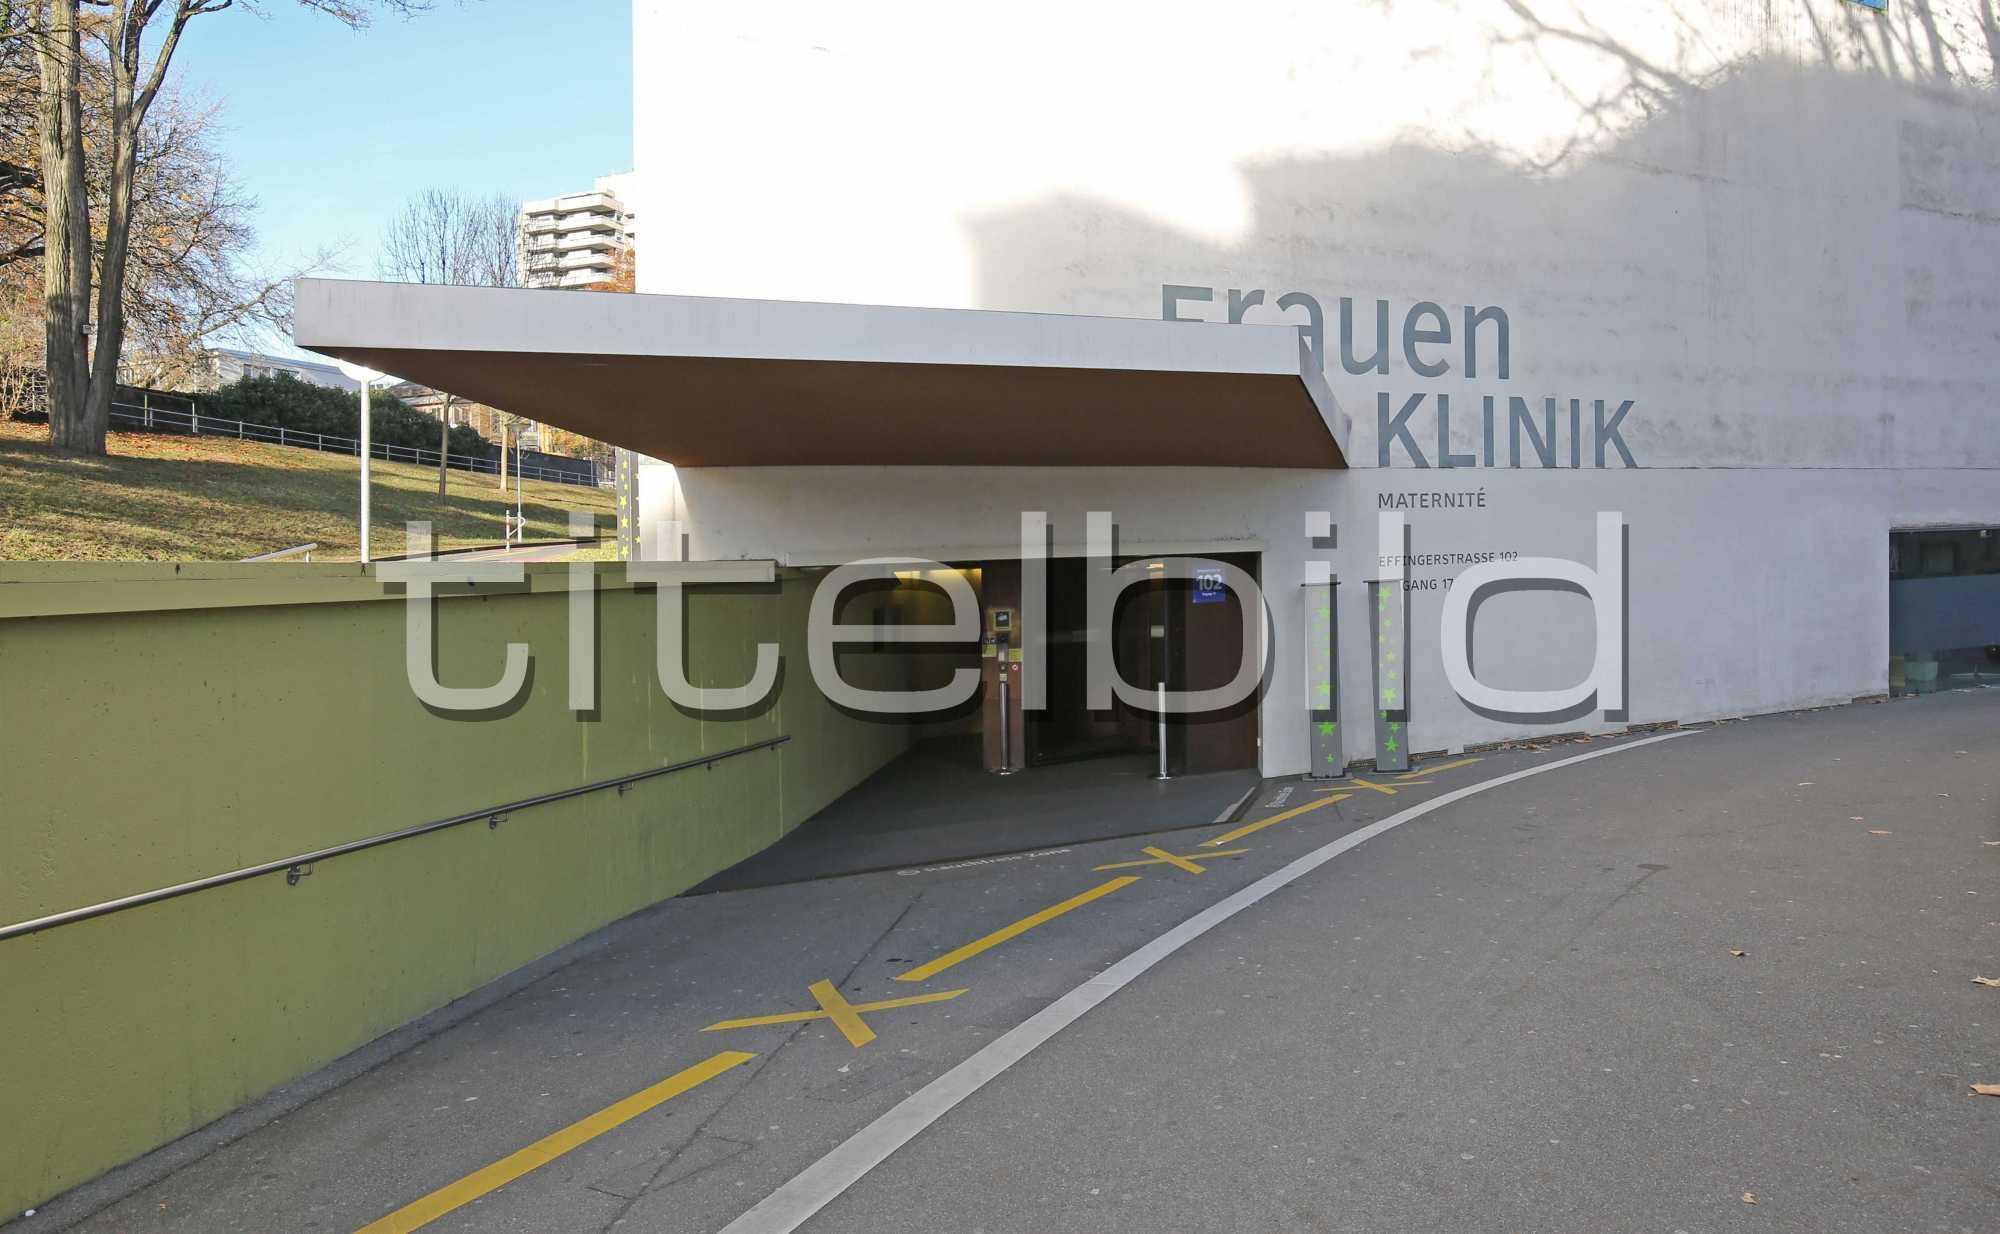 Projektbild-Nr. 2: Effingerstrasse 16, Bern